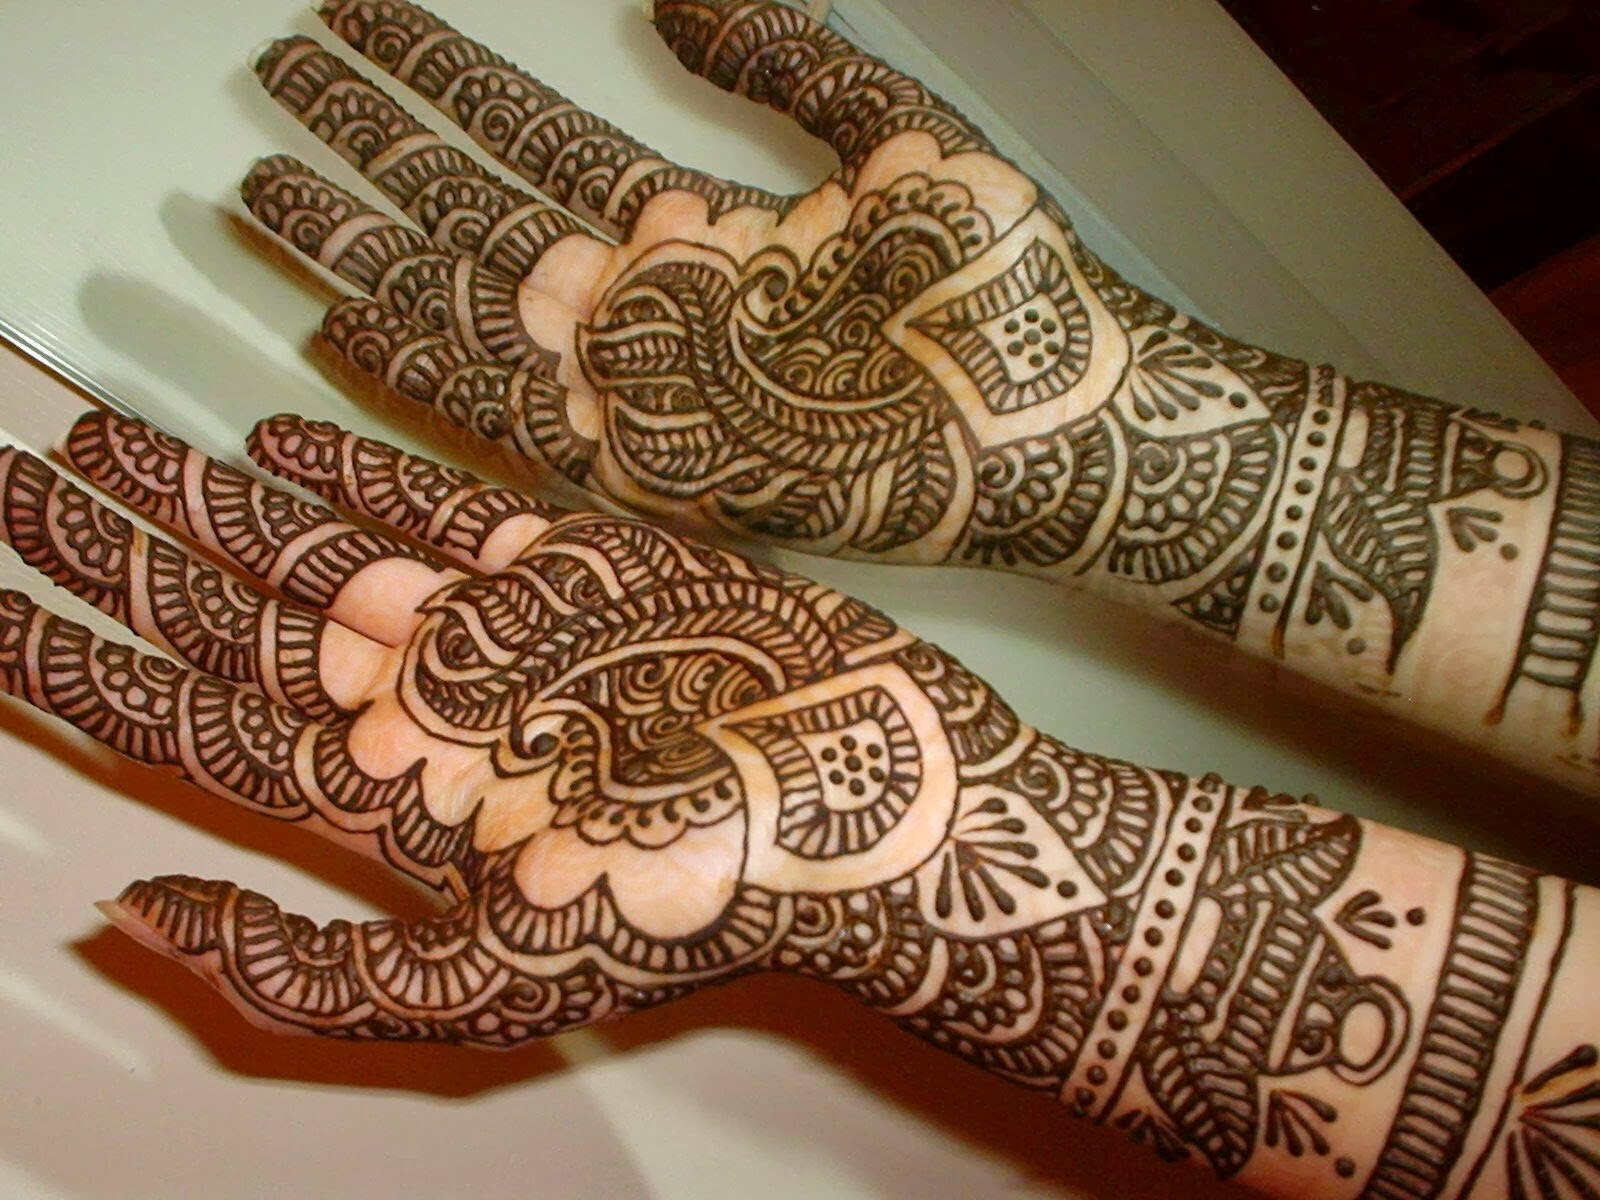 ... Designs: Simple And Beautiful Mehndi Designs Wallpapers Free Download